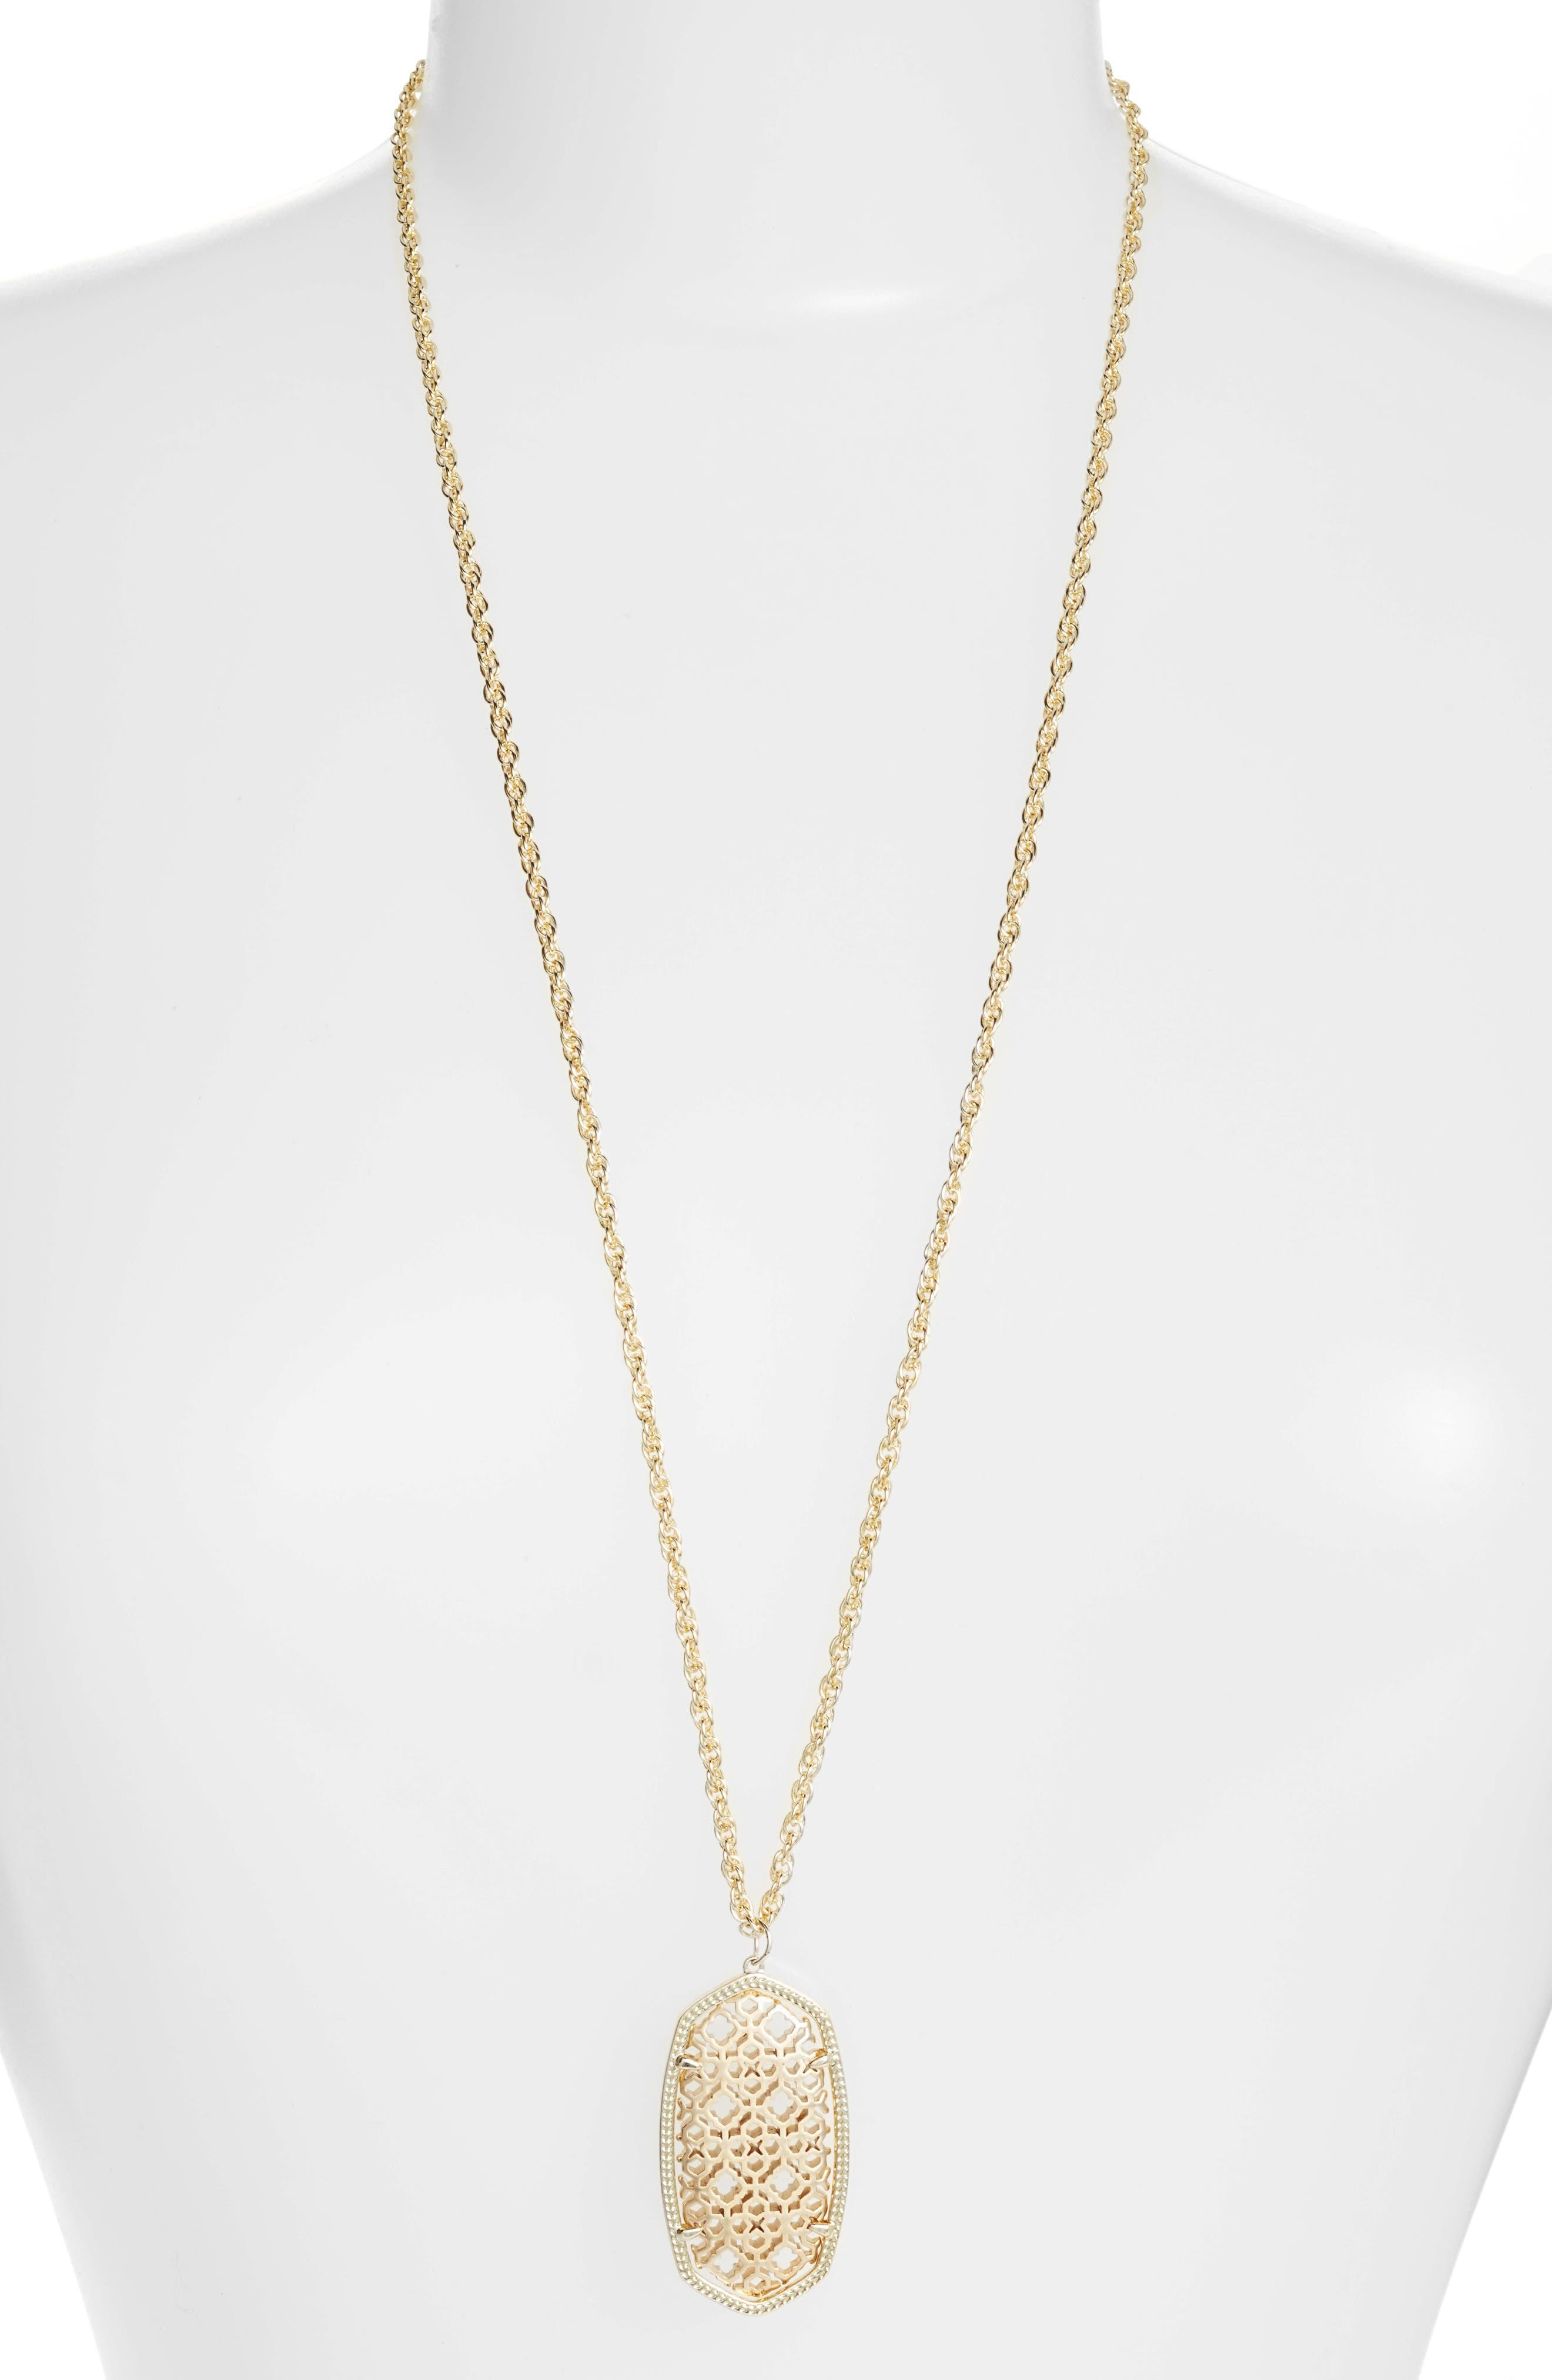 Alternate Image 1 Selected - Kendra Scott Rae Long Filigree Pendant Necklace